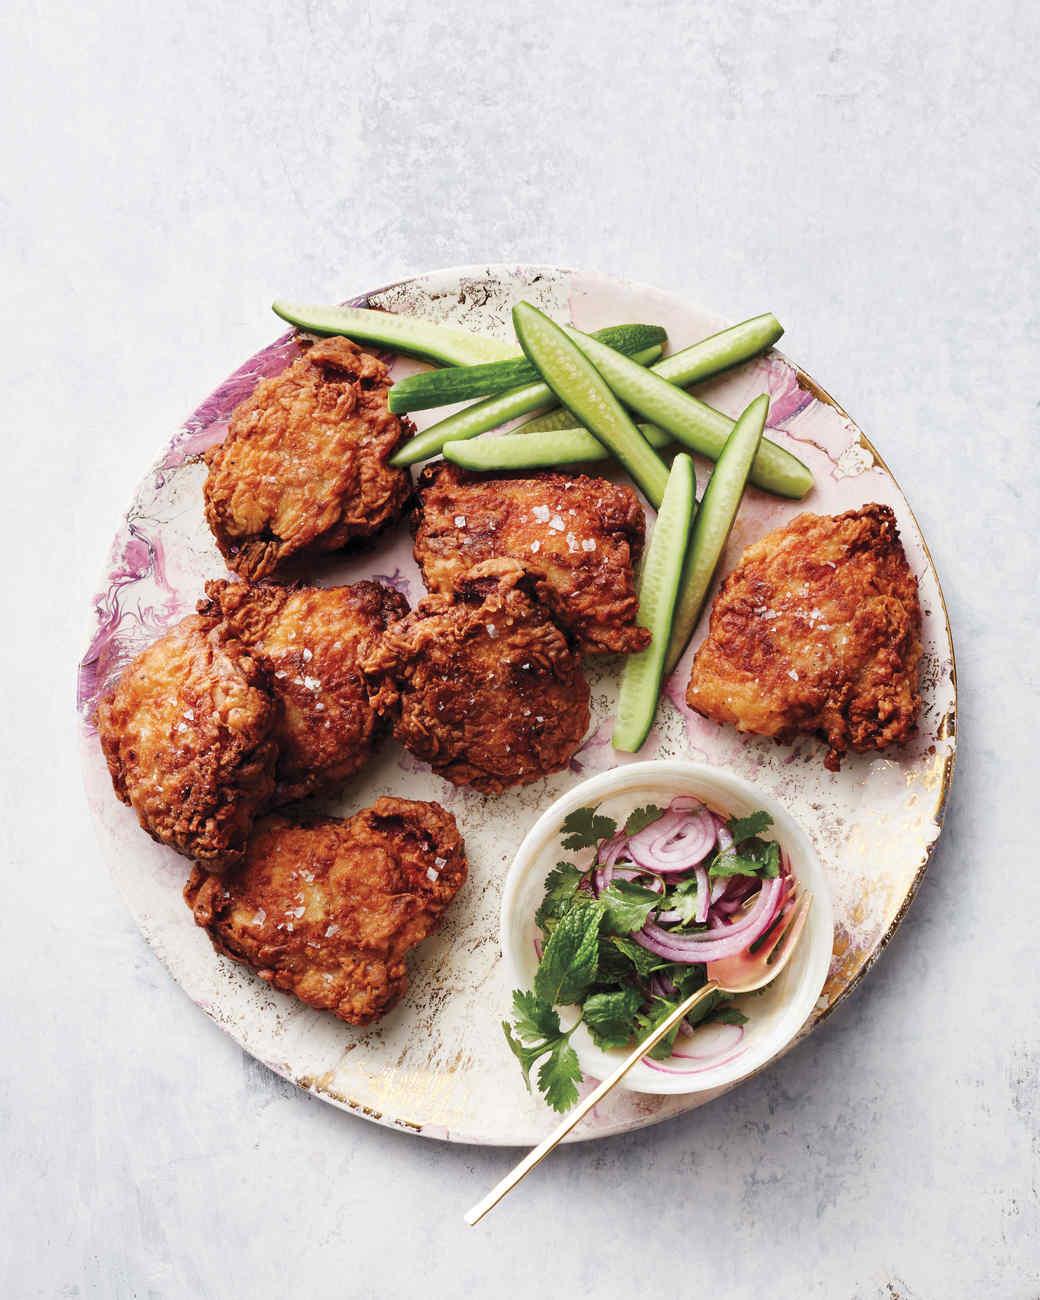 fried-chicken-096-d112797-0416.jpg